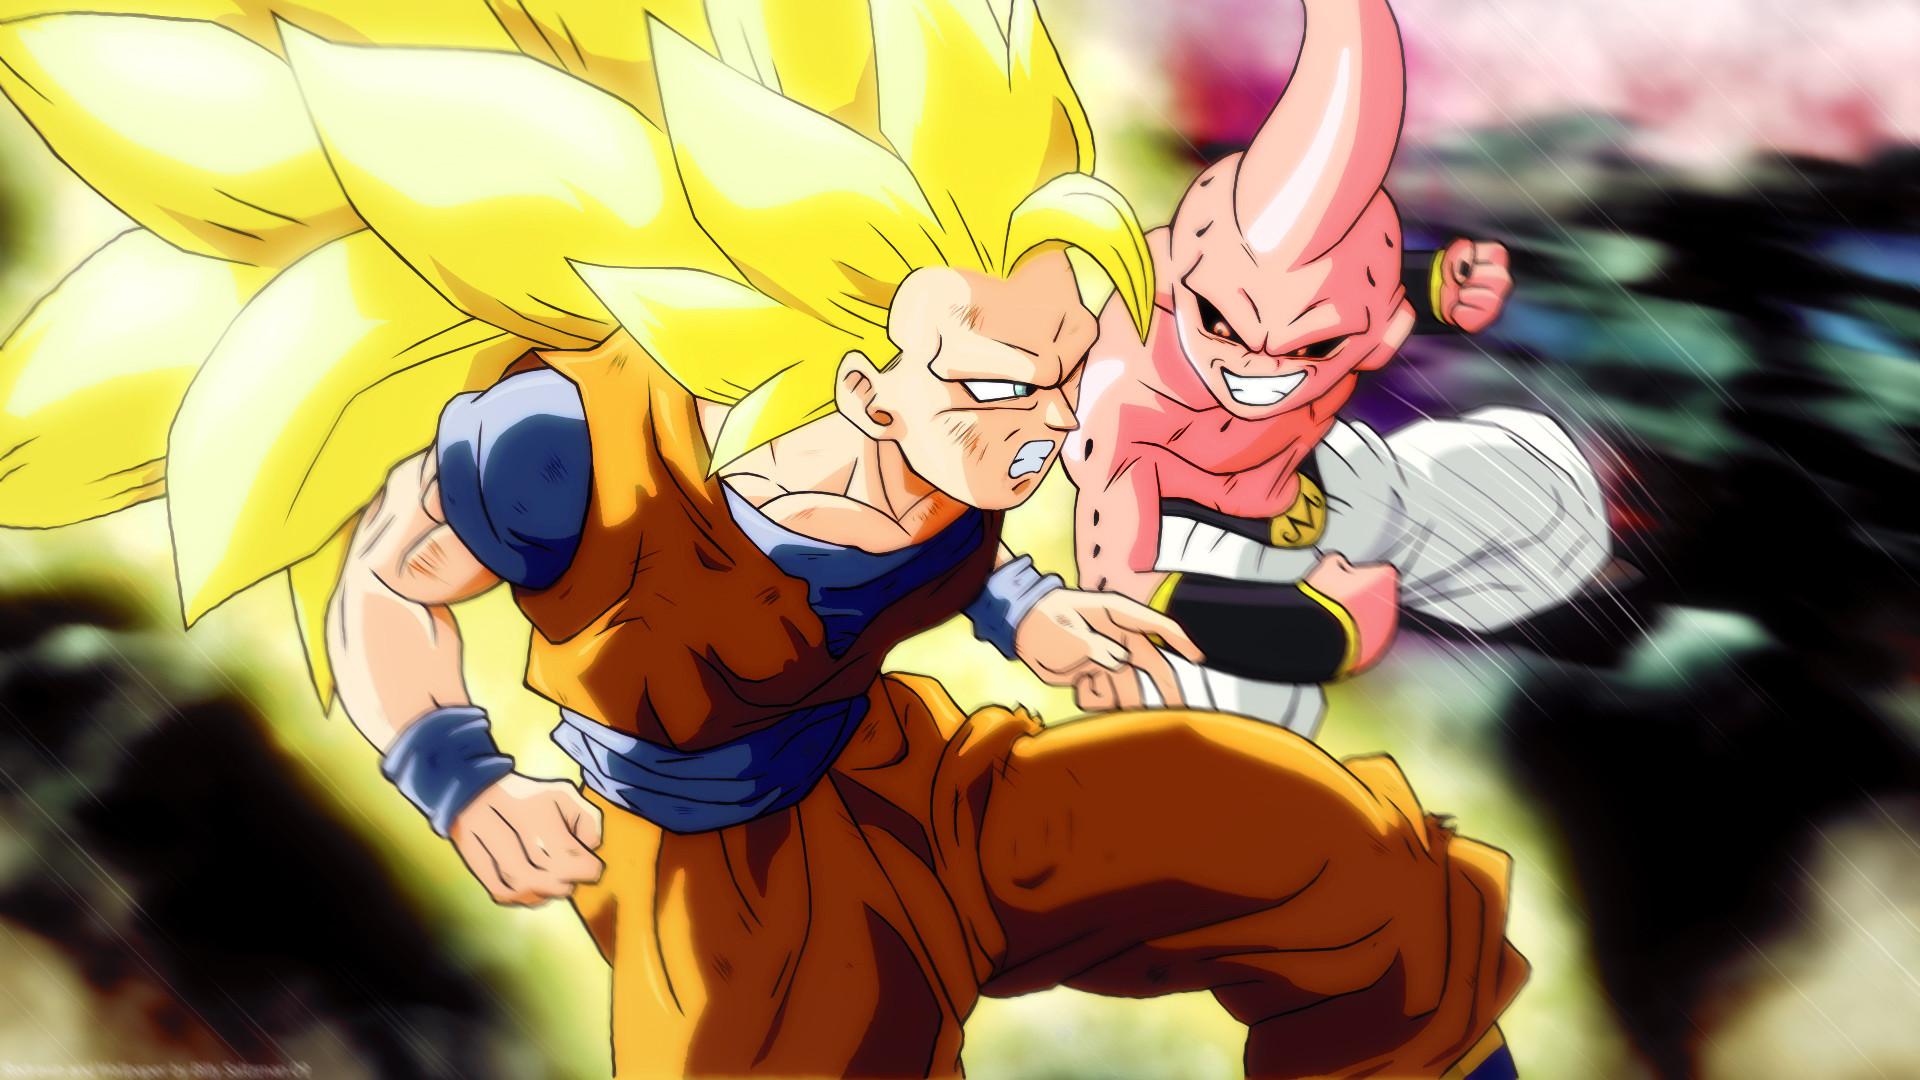 Res: 1920x1080, Goku vs Buu Wallpaper by Billysan291 Goku vs Buu Wallpaper by Billysan291